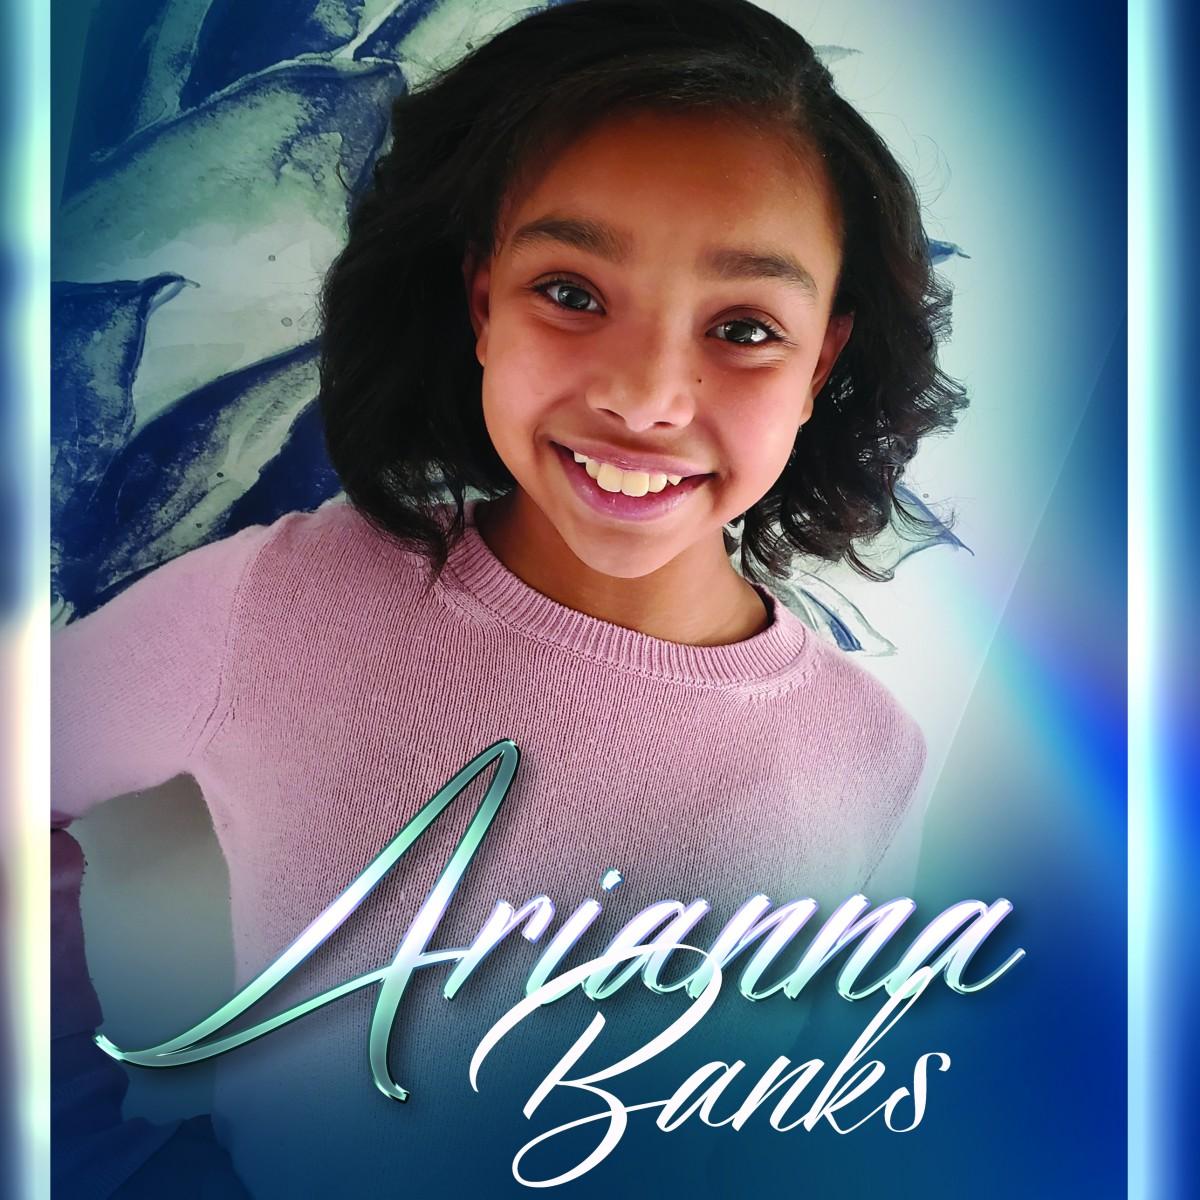 Arianna Banks